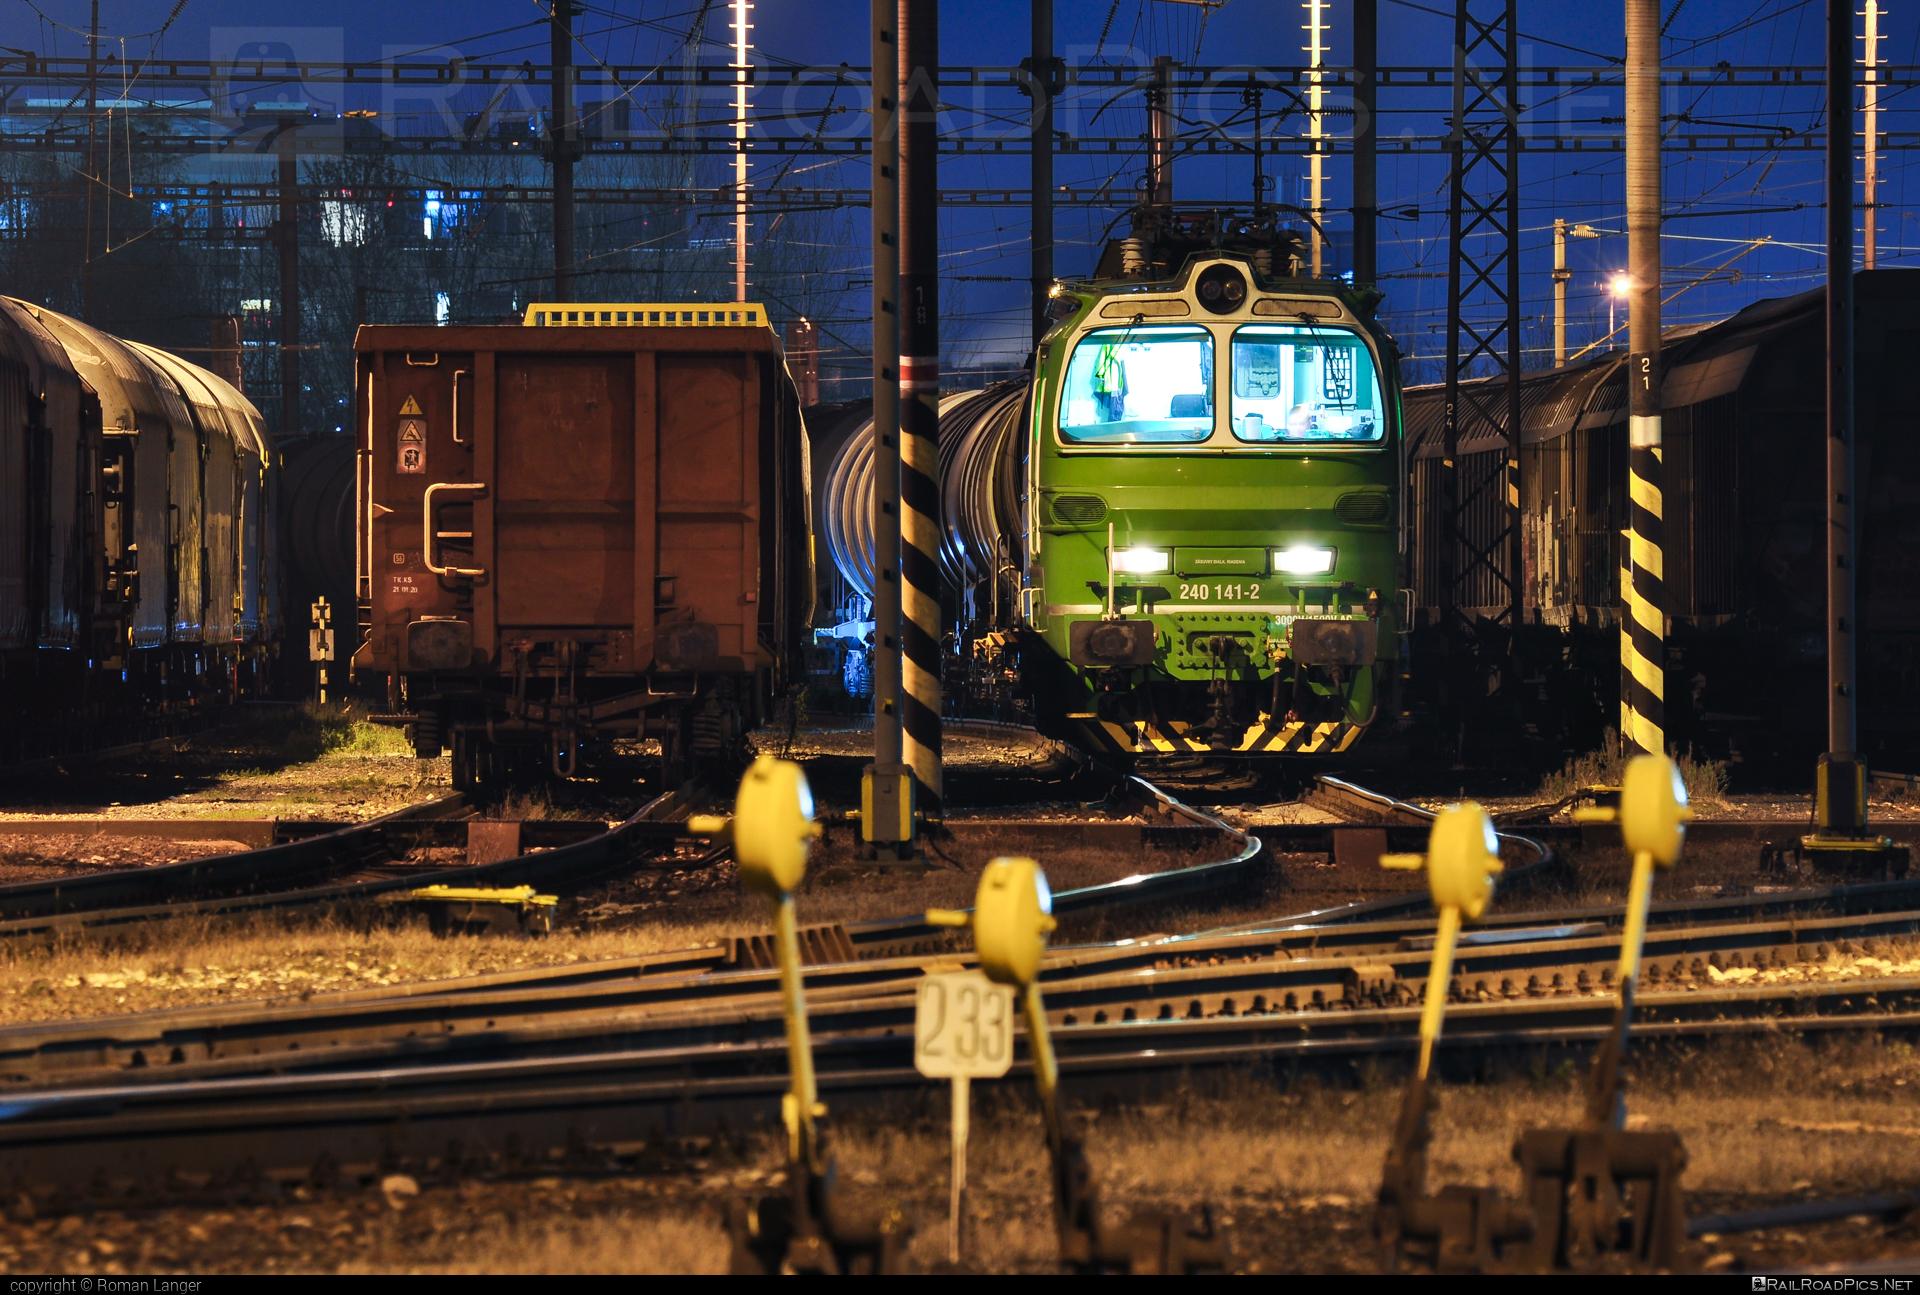 Škoda 47E - 240 141-2 operated by Railtrans International, s.r.o #RailtransInternational #laminatka #locomotive240 #rti #skoda #skoda47e